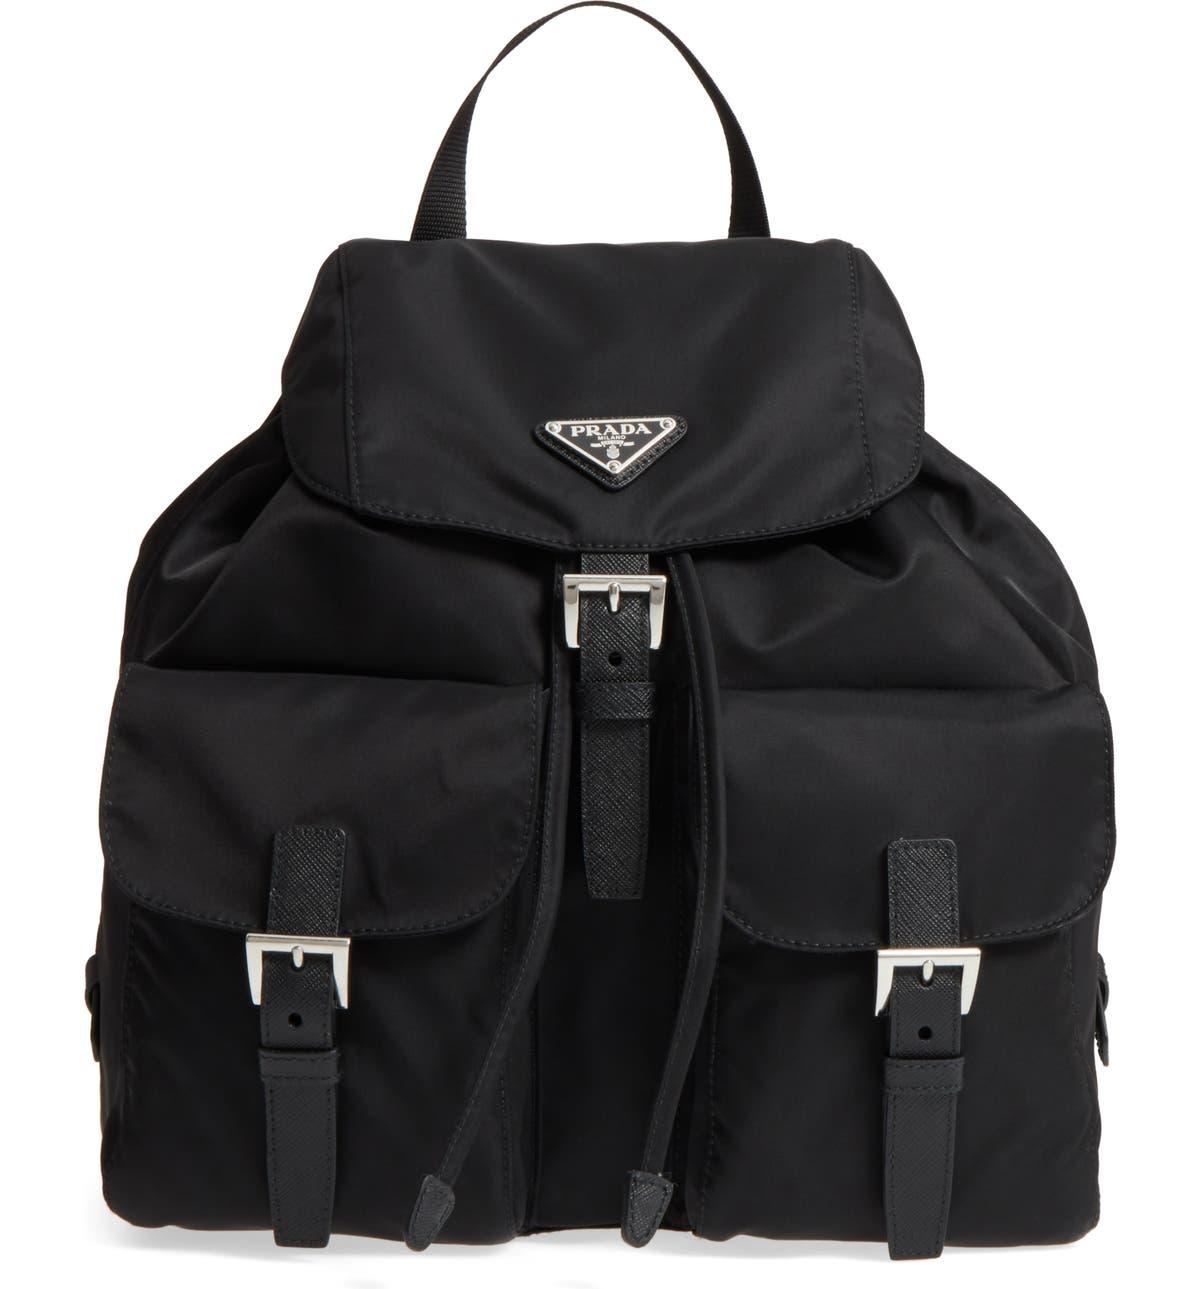 38ee3174c6da Prada Large Nylon Backpack | Nordstrom